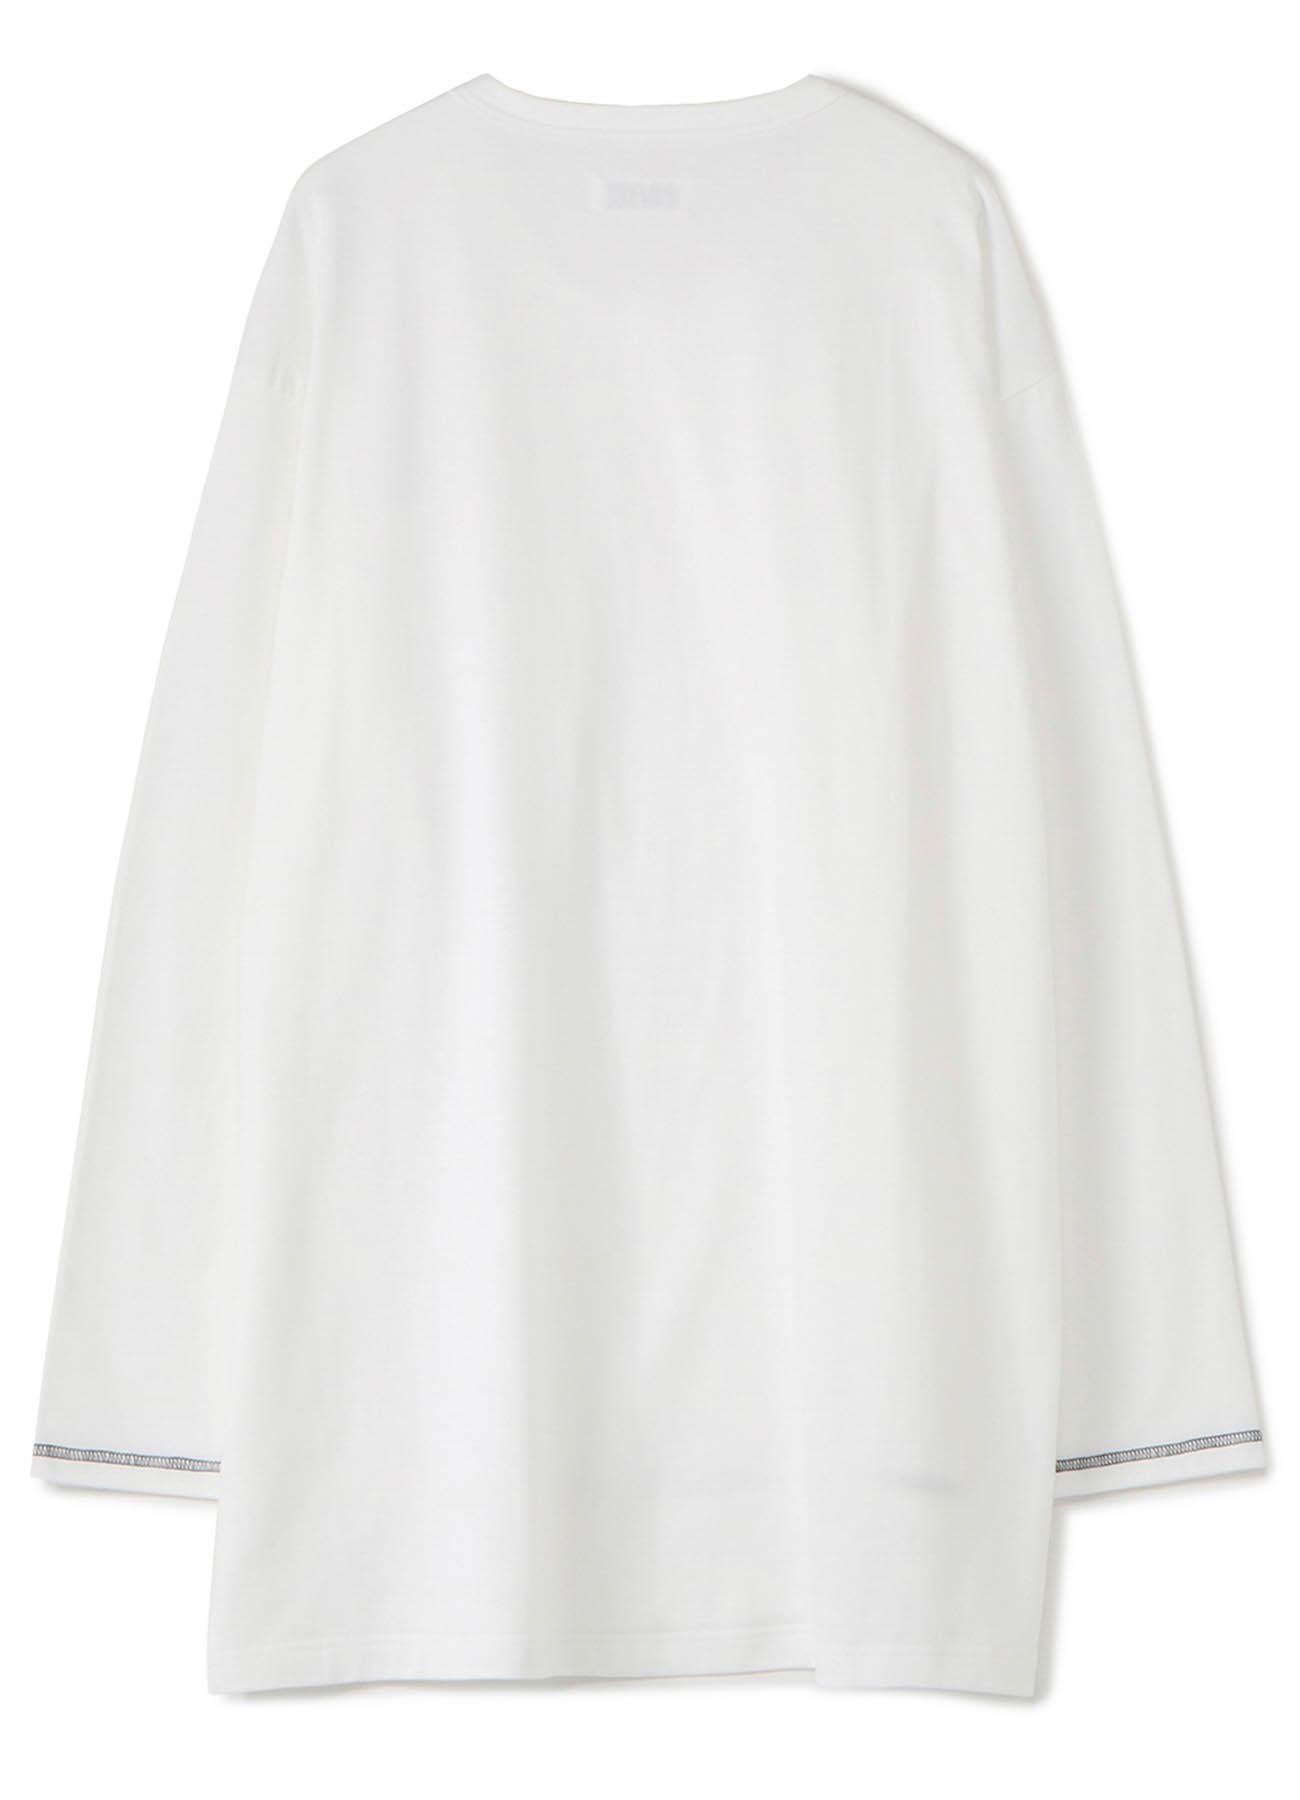 40/2 Cotton Jersey Crew Neck Half-Layered ColorLock Long Sleeve T-Shirt